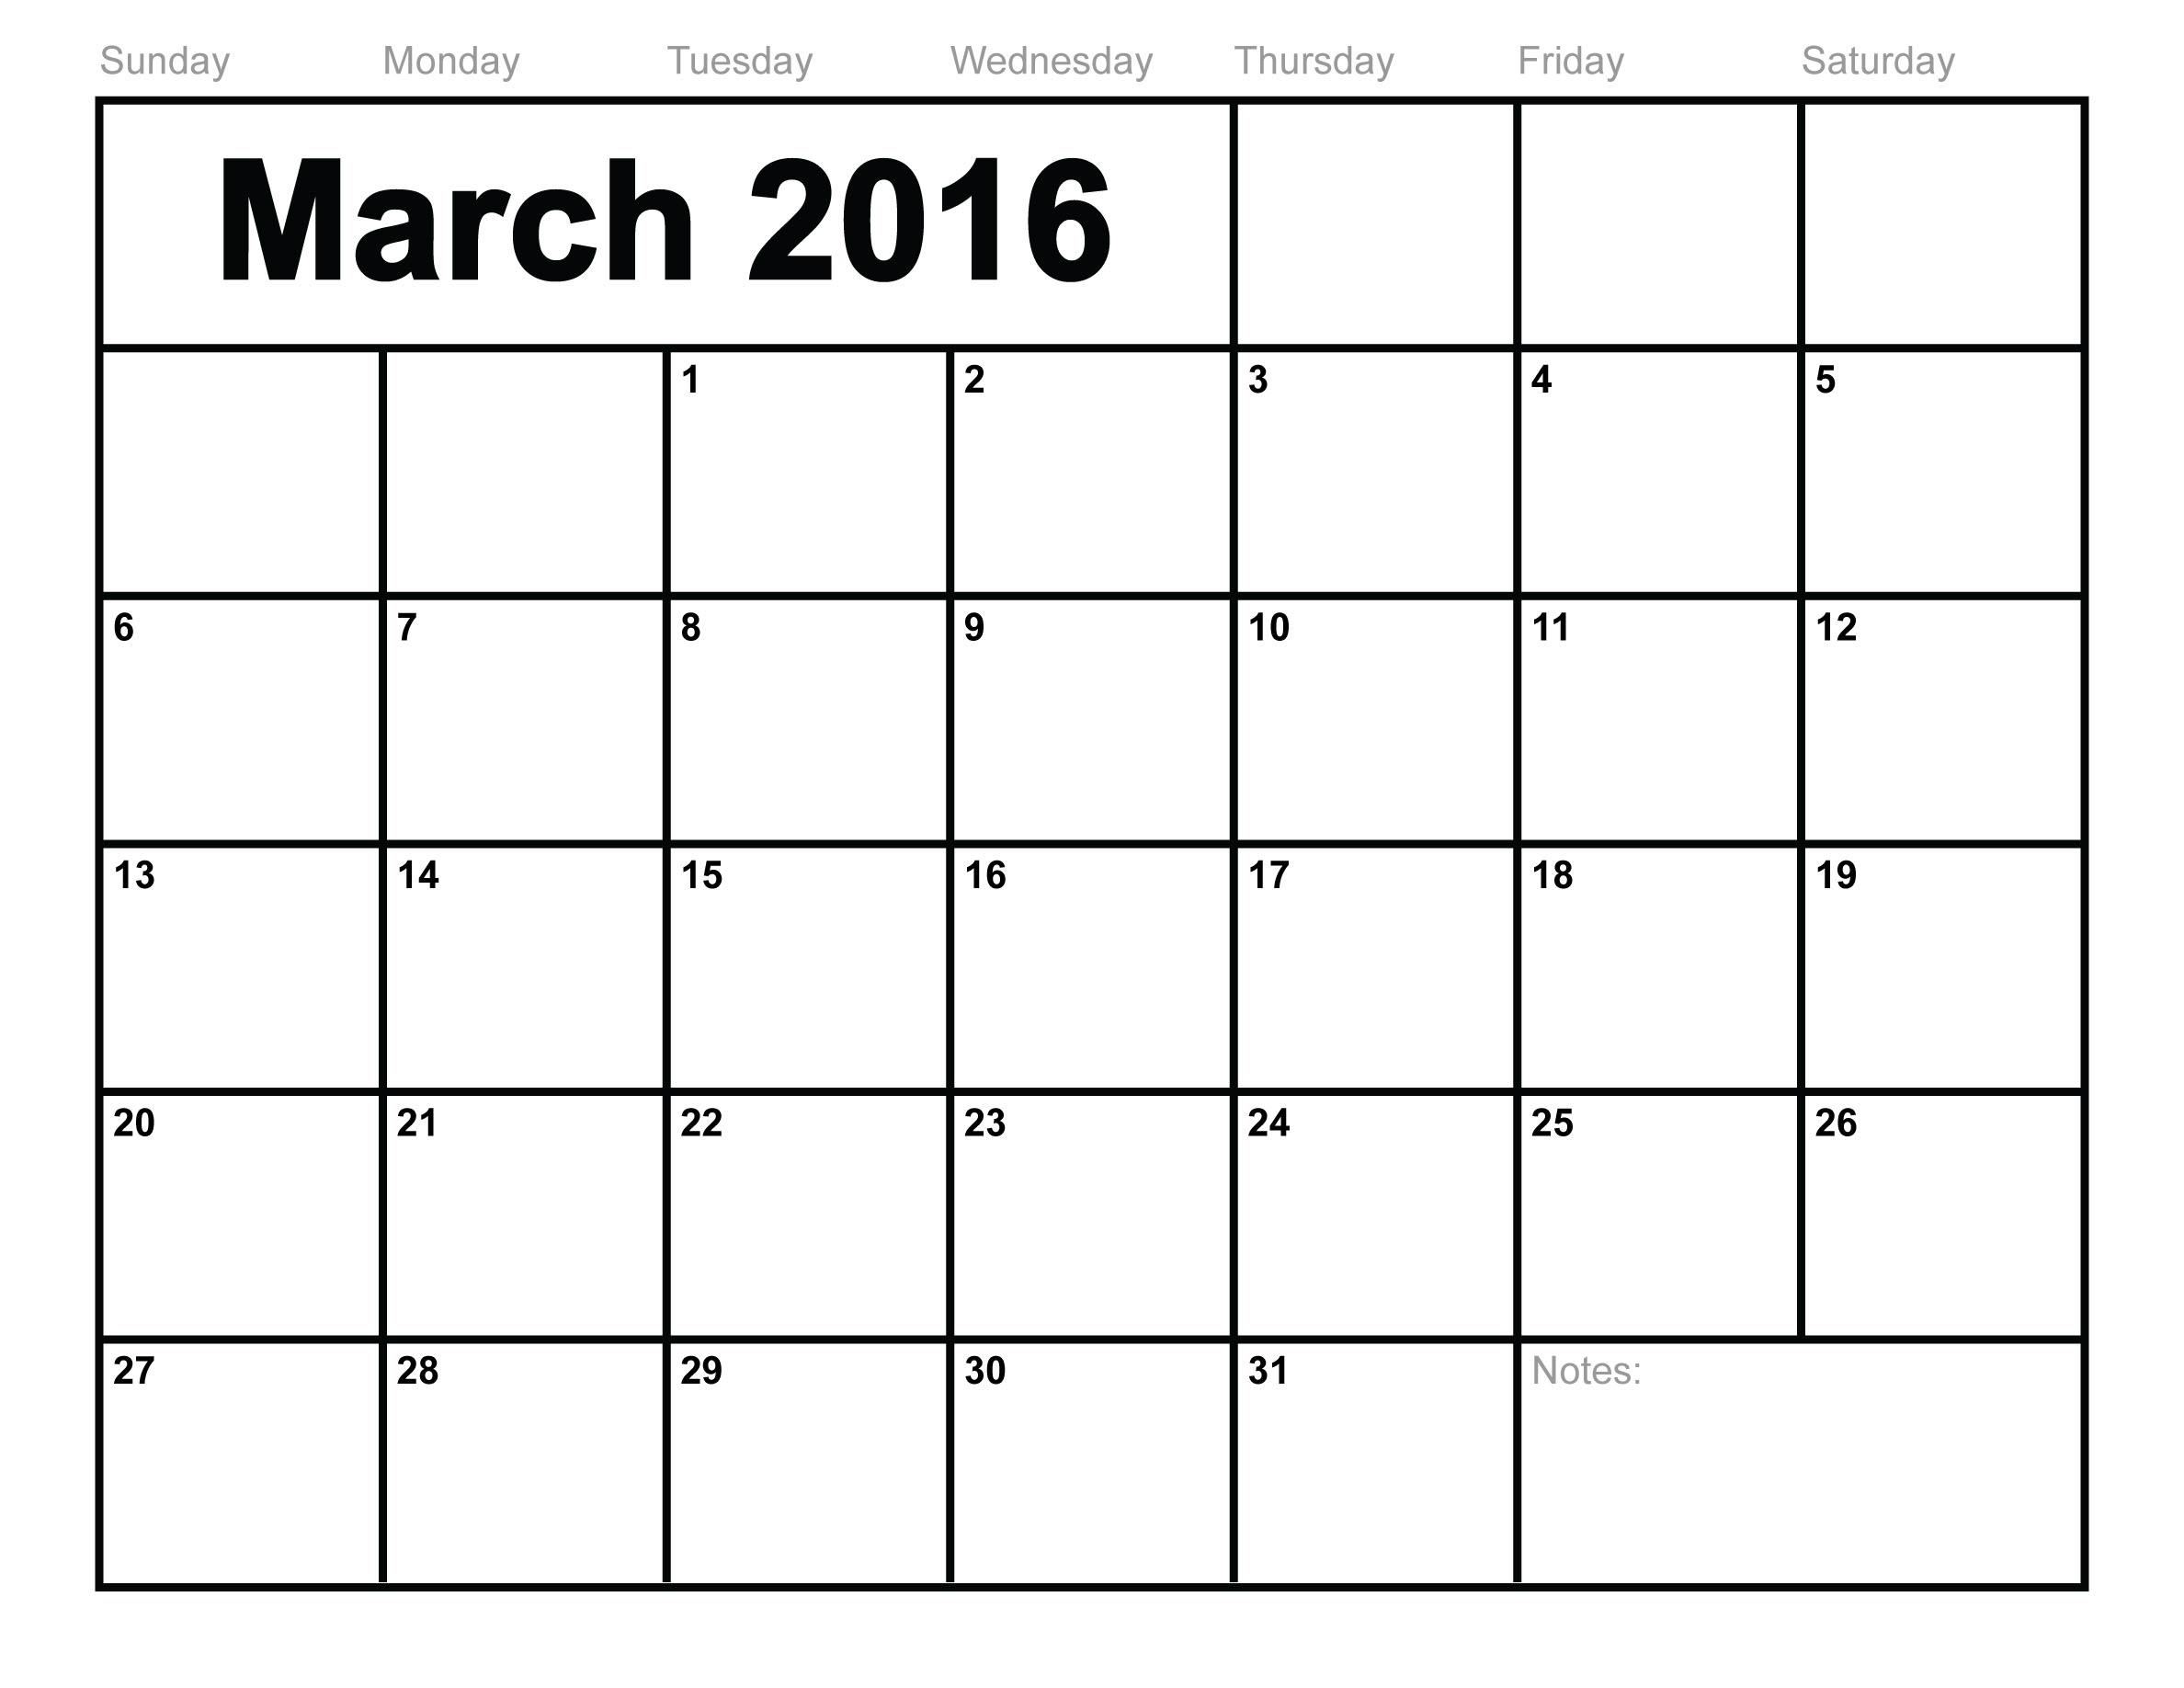 March 2016 calendar printable free blank calendar 2016.